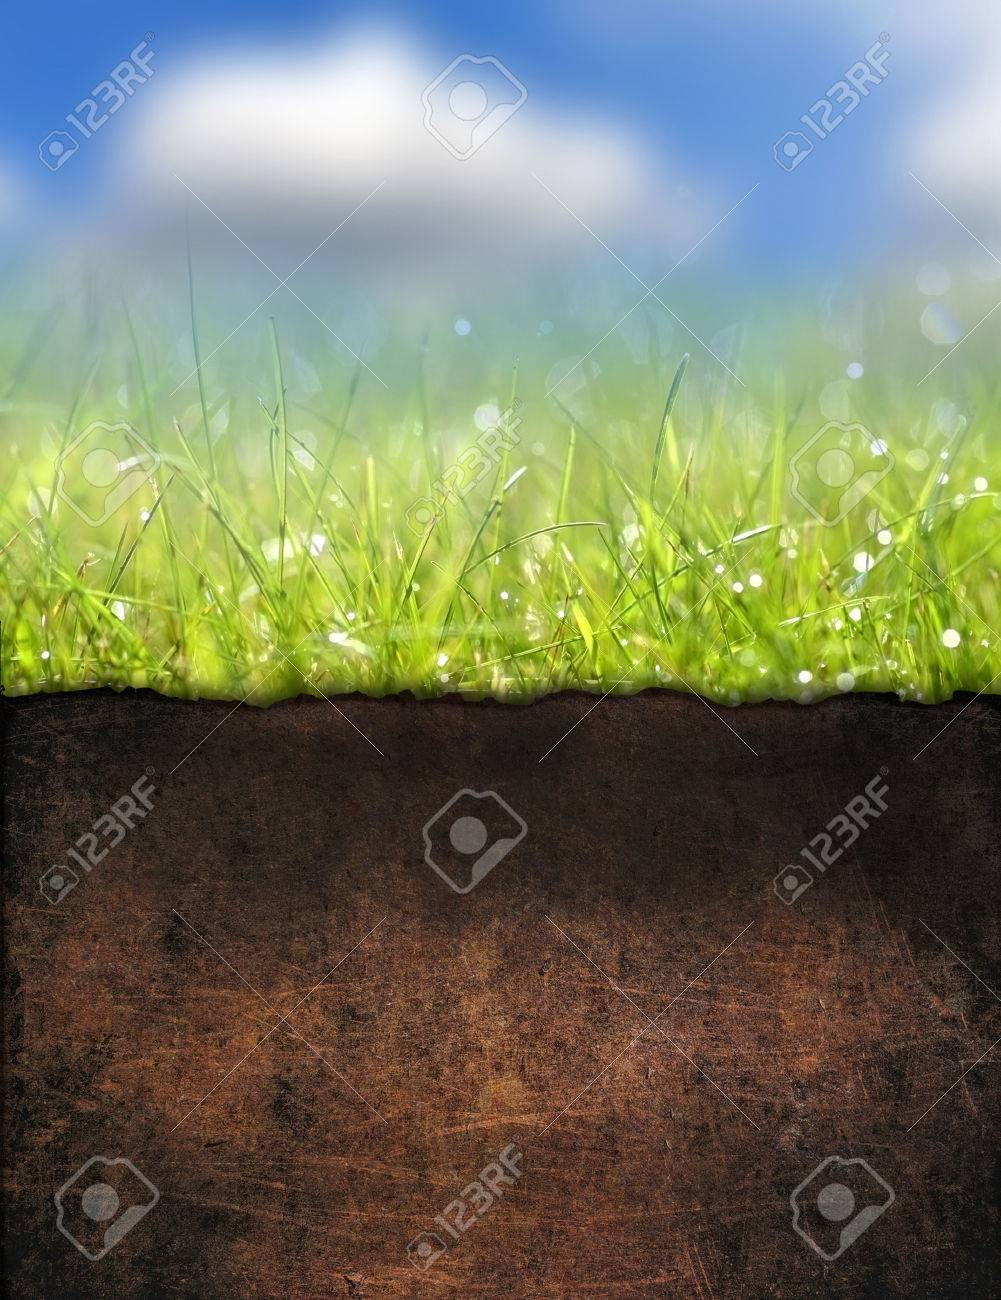 Underground soil Stock Photo - 23053381